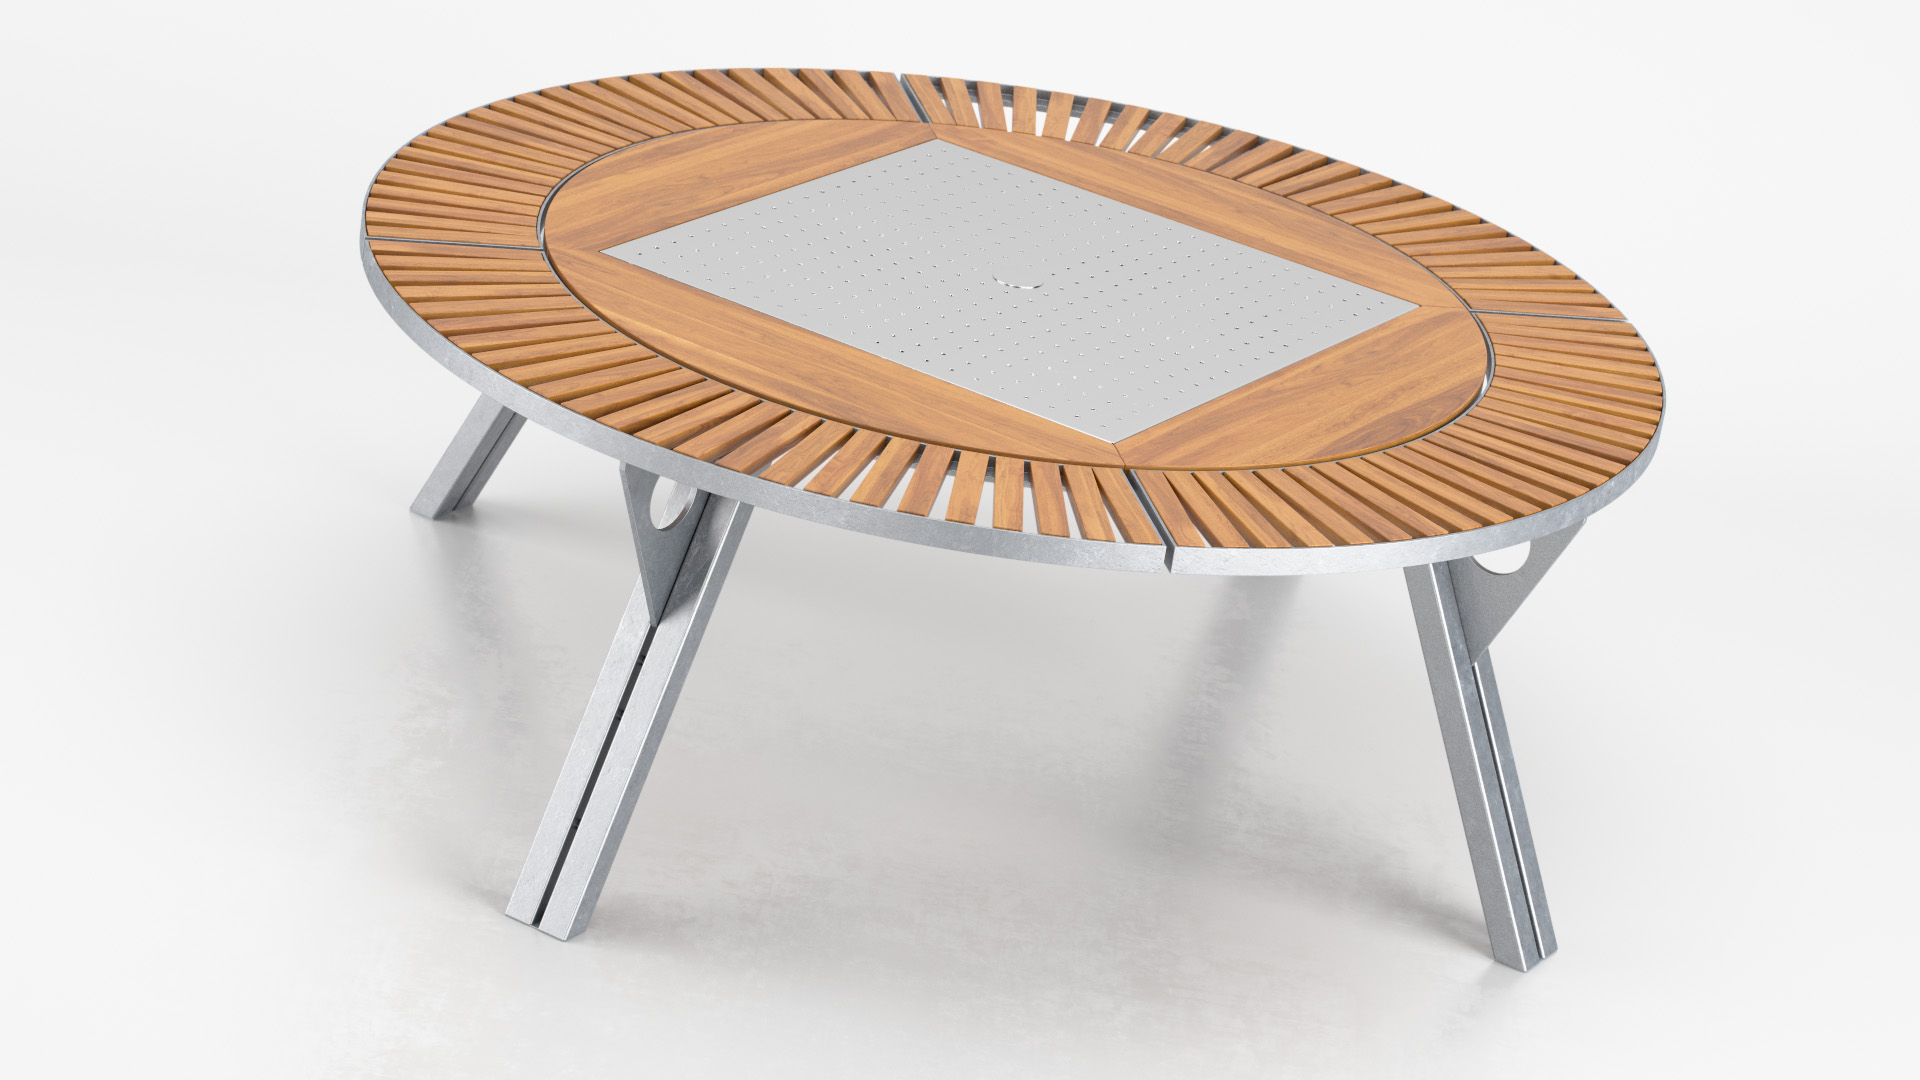 Gargantua_Table_Mode2_WhiteSet_01_0003